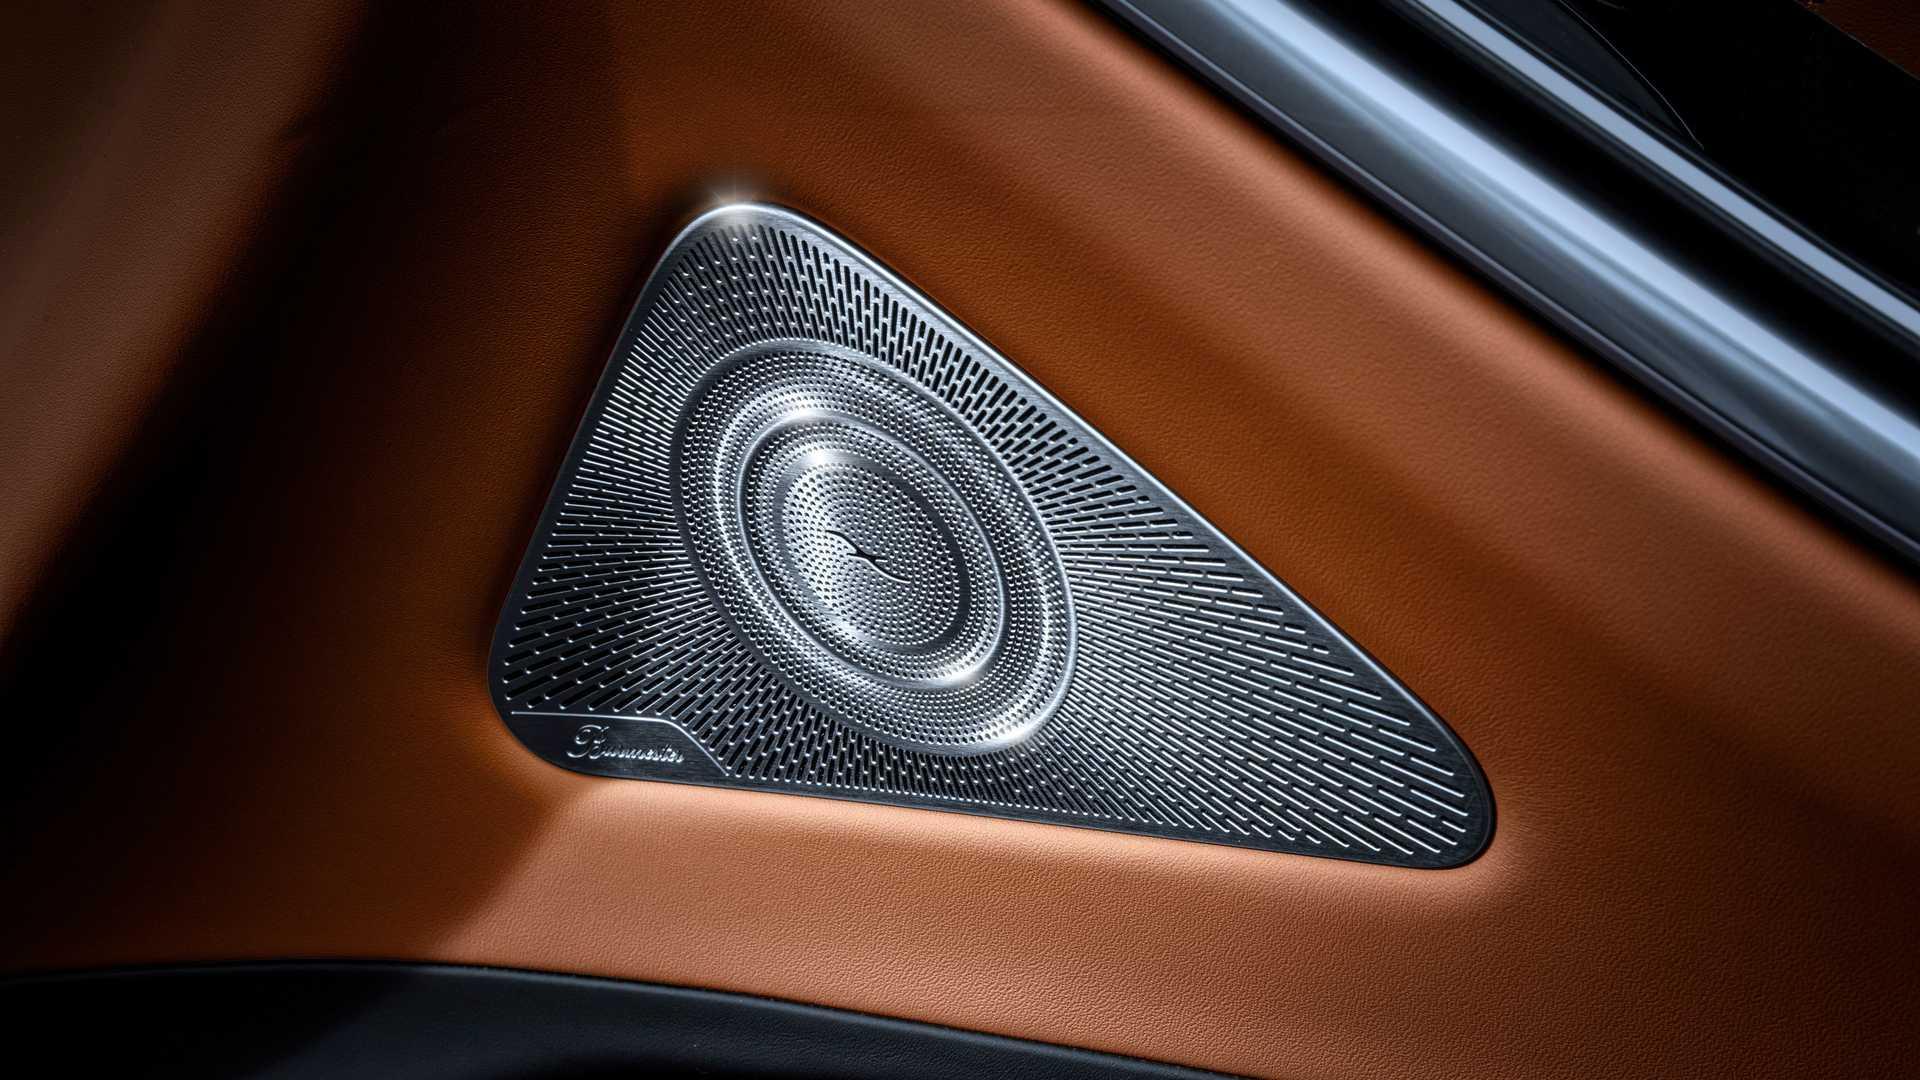 2021-mercedes-benz-s-class-interior-details-1